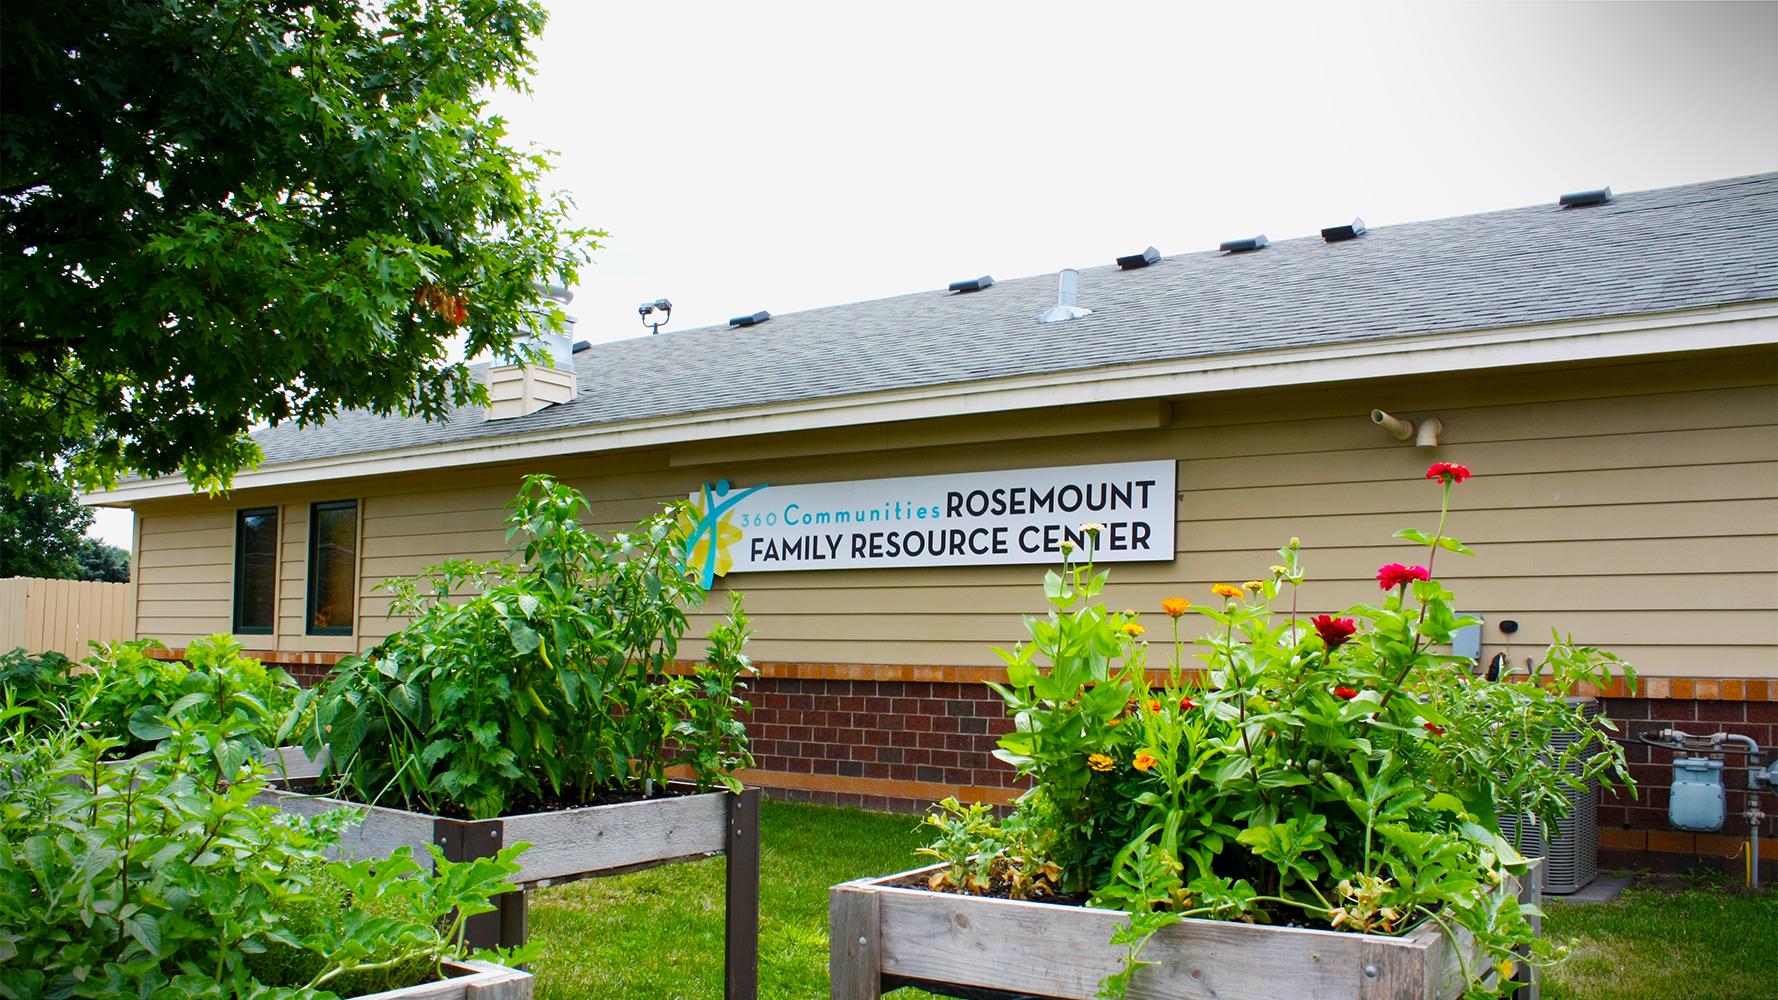 360 Communities - Rosemount Family Resource Center